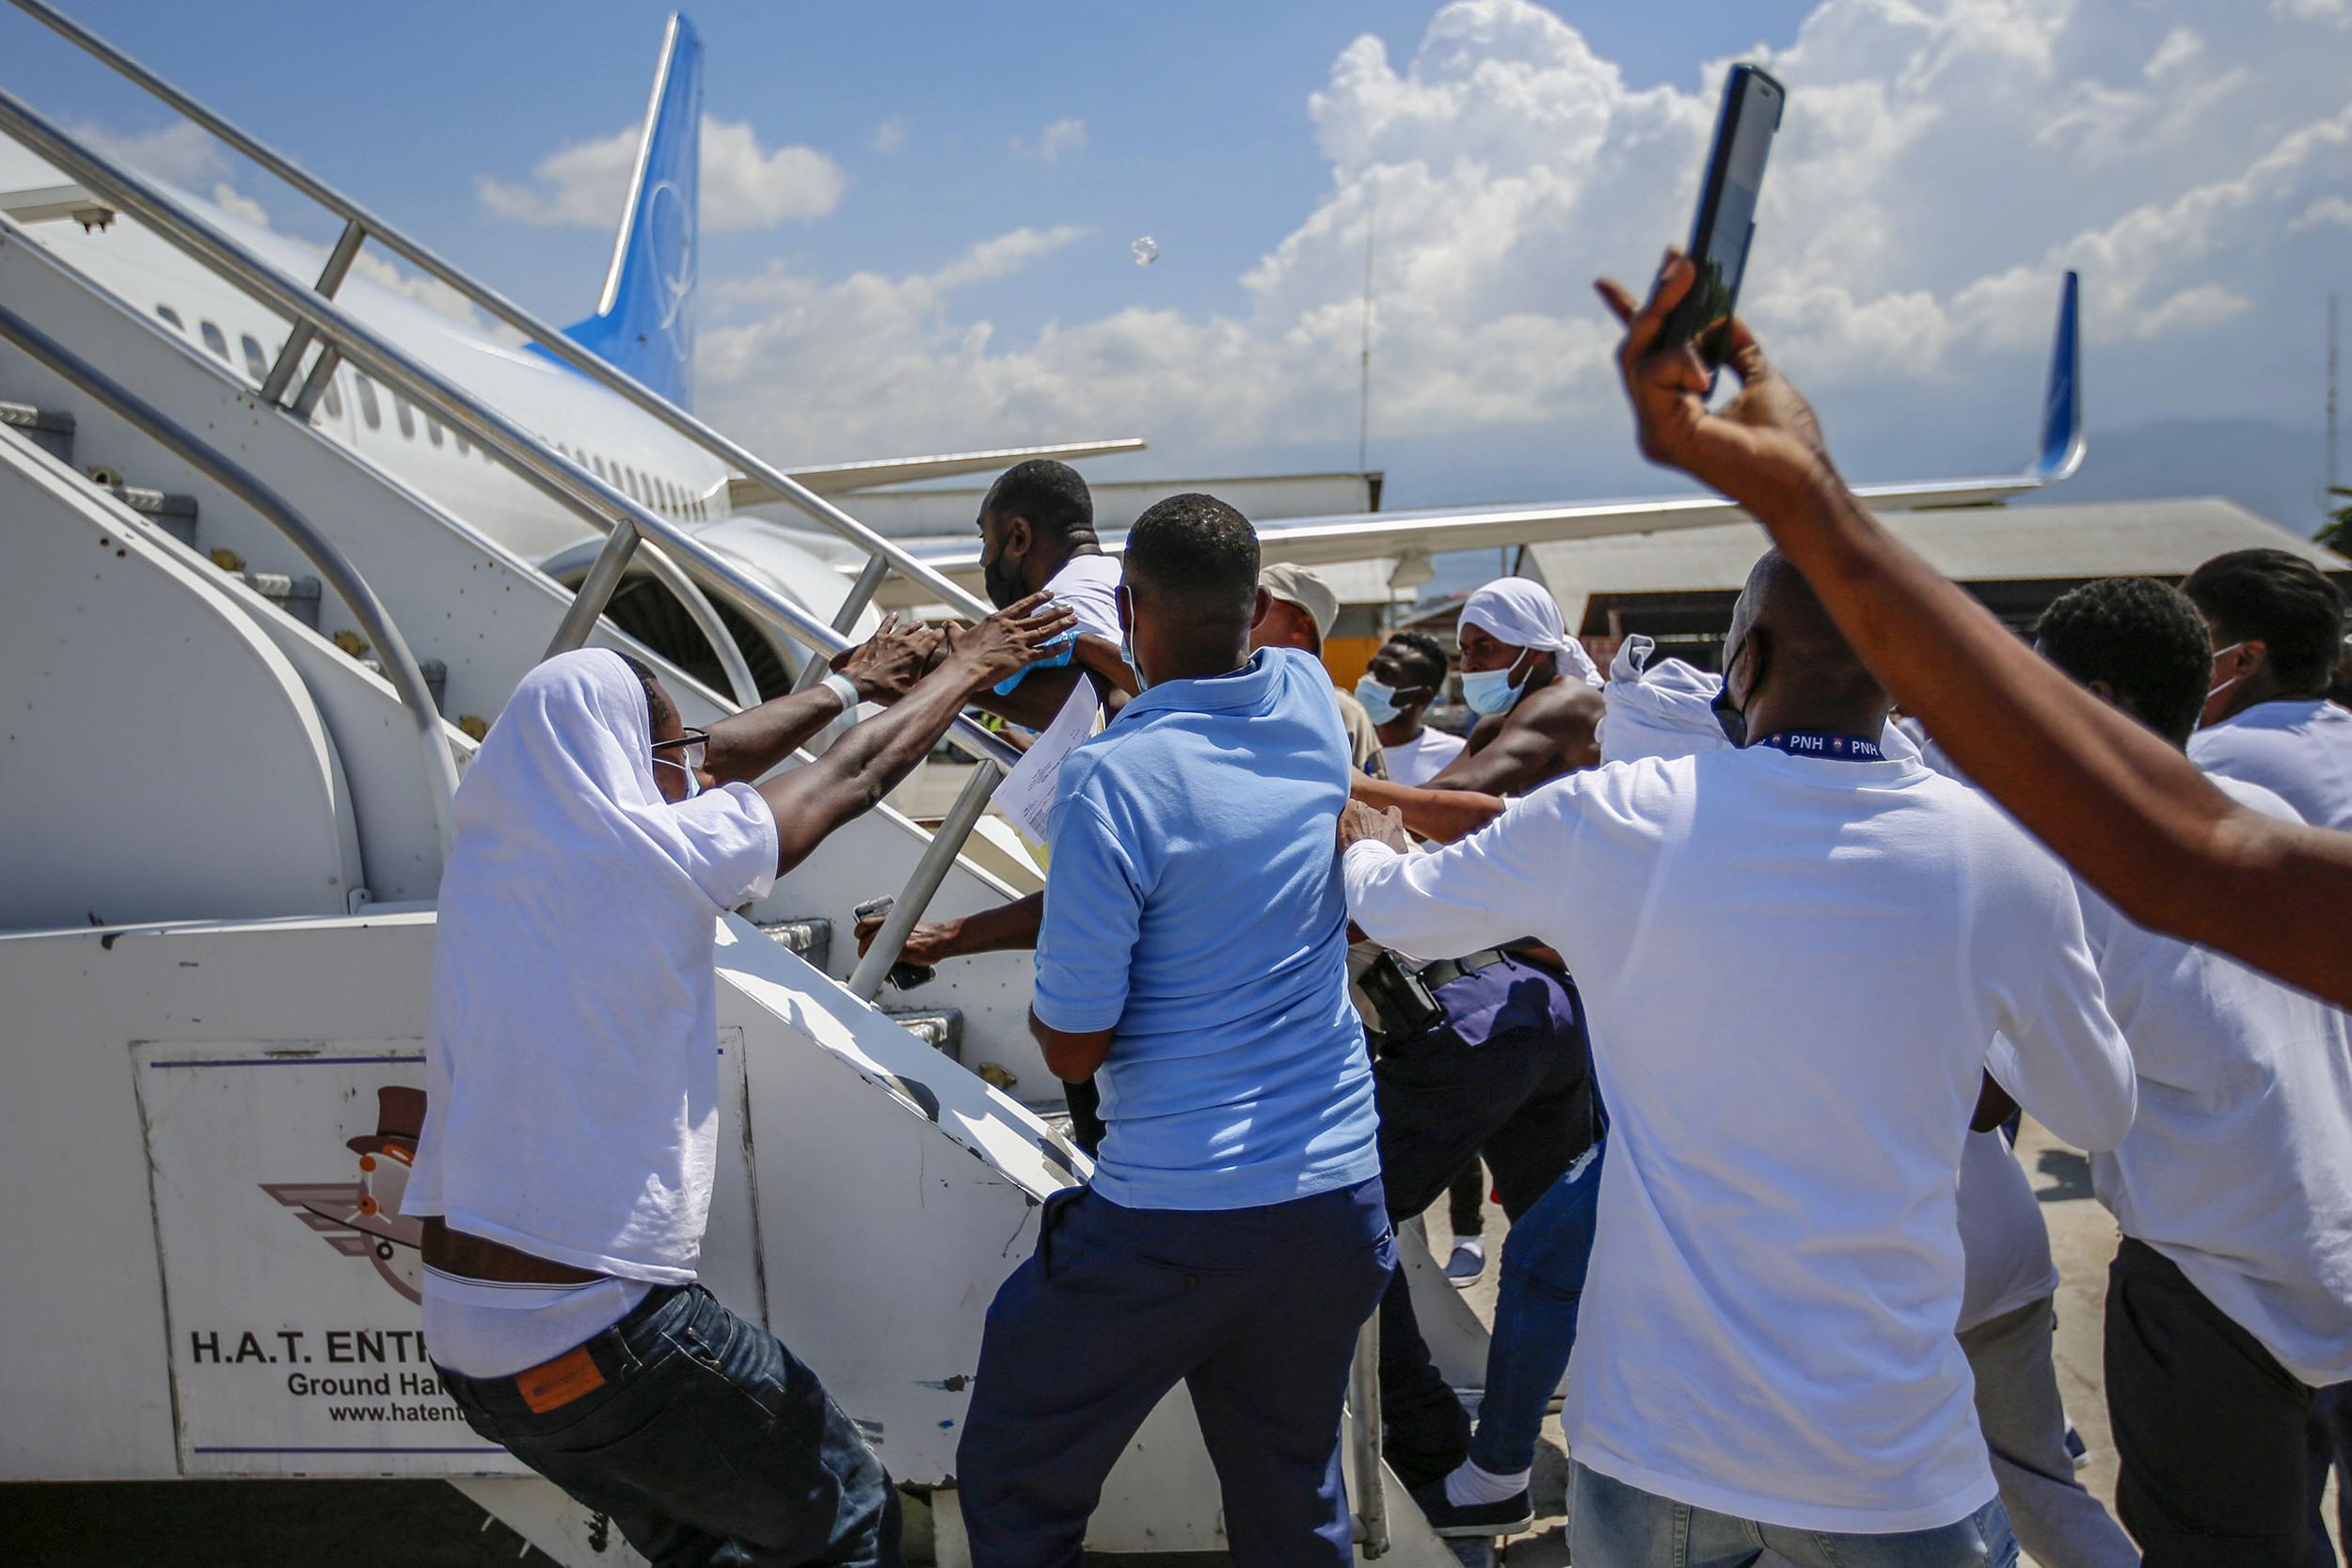 Haitian deportees assaulted U.S. pilots, injured three ICE officers